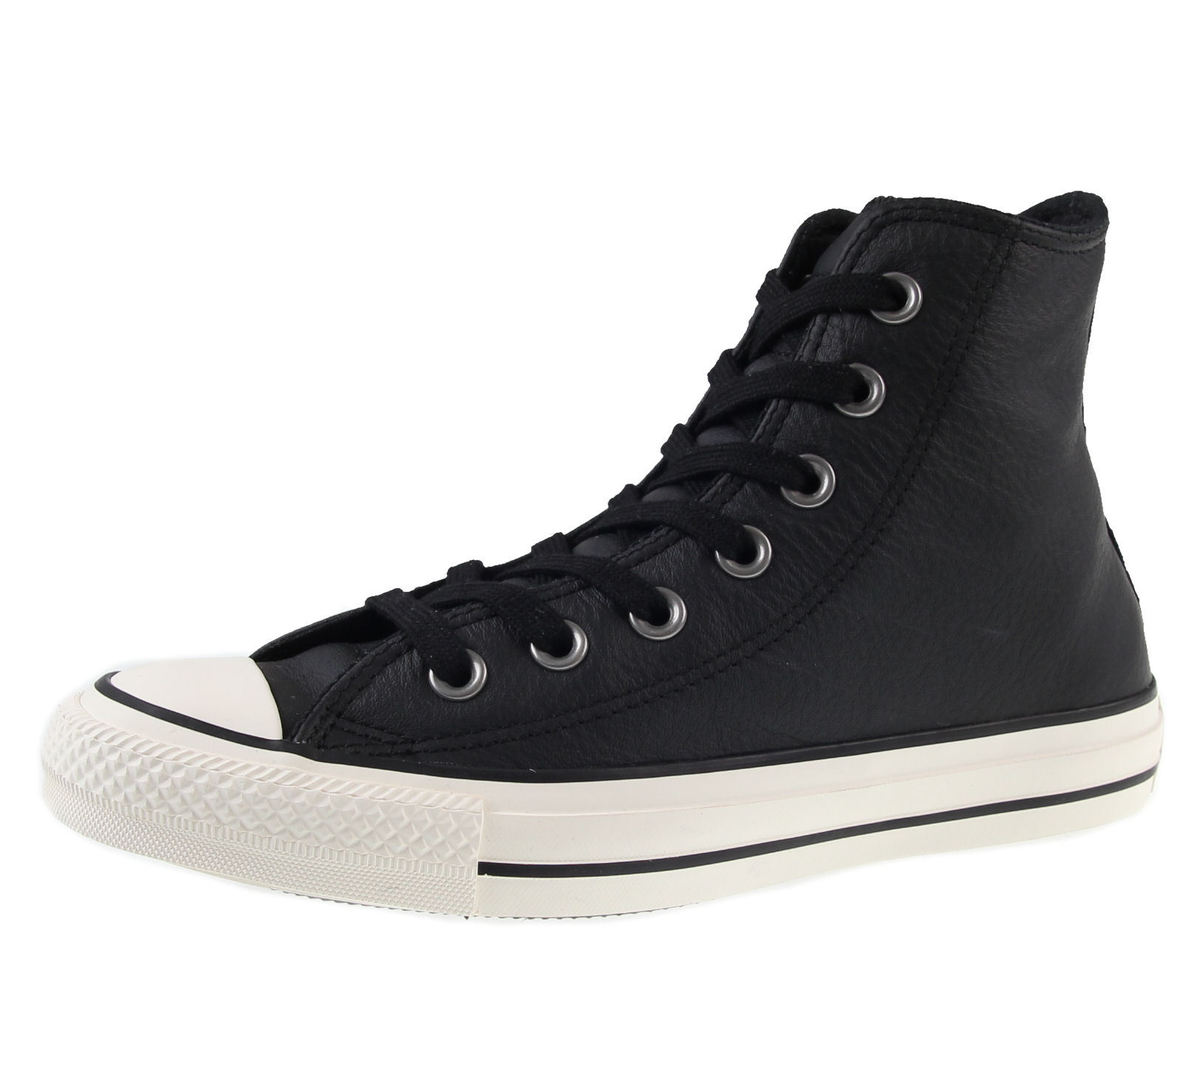 boty CONVERSE - Chuck Taylor All Star - Black/Black - C151112